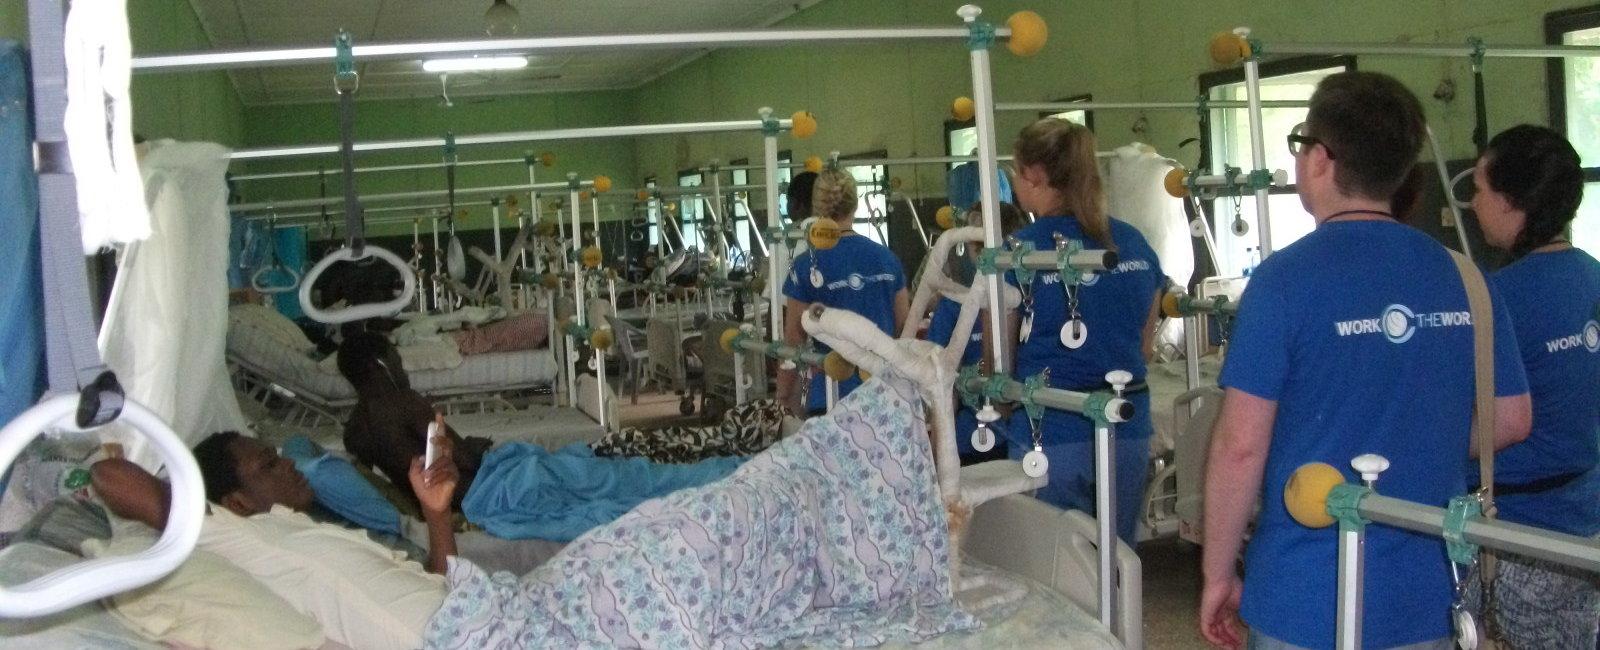 Stacey Valentine - Nursing Electives in Ghana Takoradi